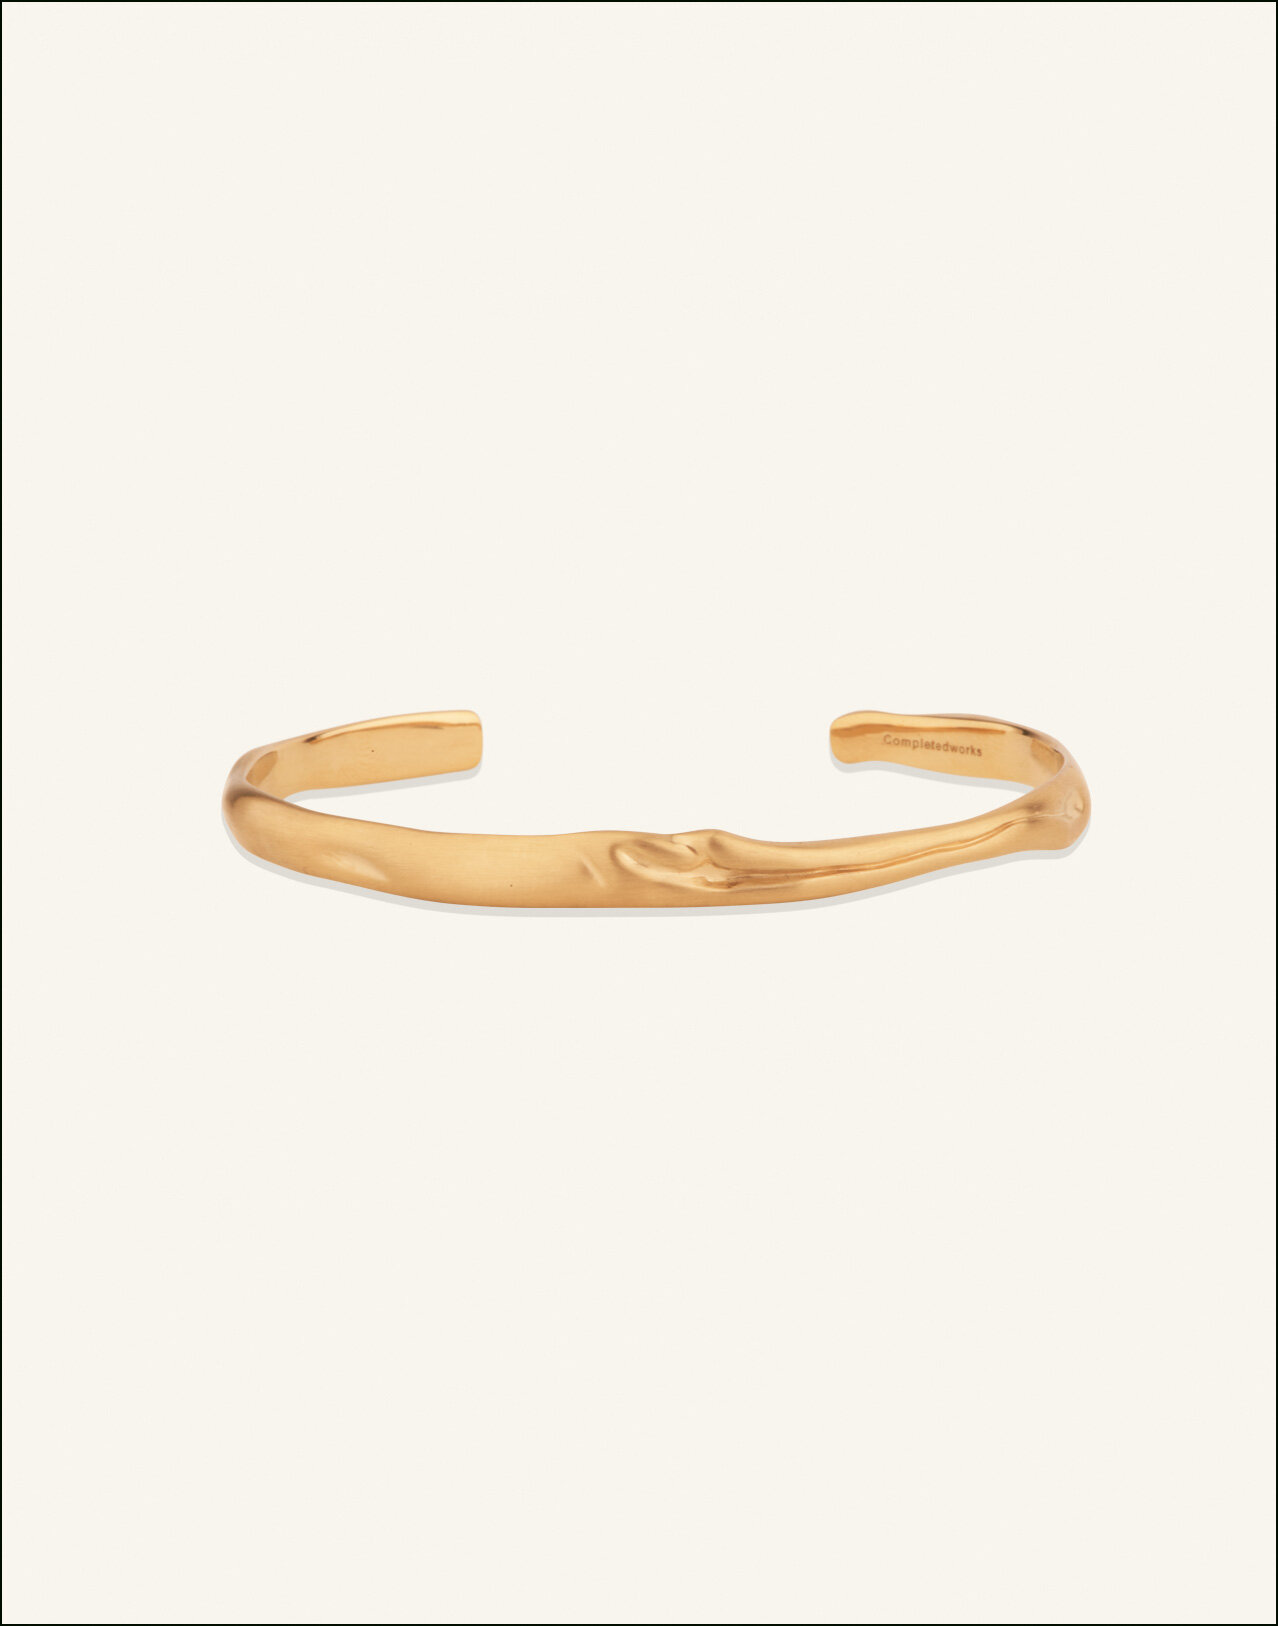 Completedworks-Gold-Vermeil-Cuff-Unconscious-Landscapes-1.jpg